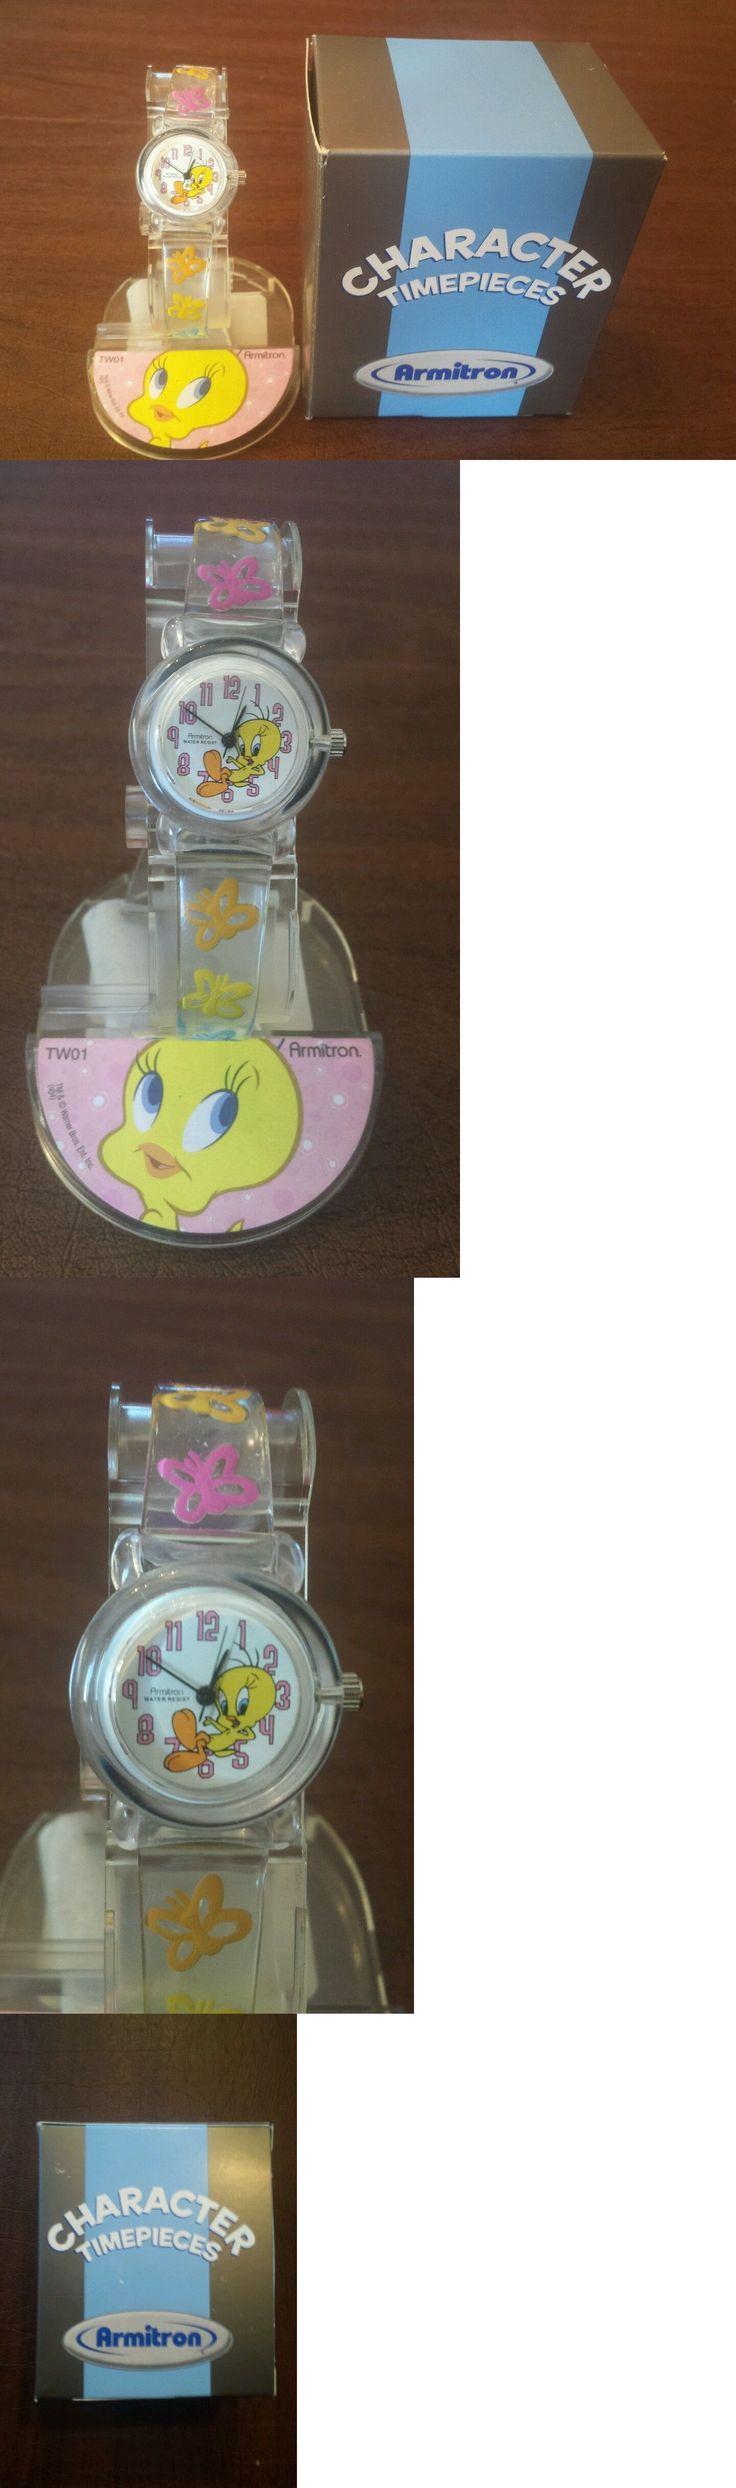 Flintstones 19225: Rare Vintage Tweety Bird Character Watch Display Box New Old Stock Cute ! -> BUY IT NOW ONLY: $35 on eBay!